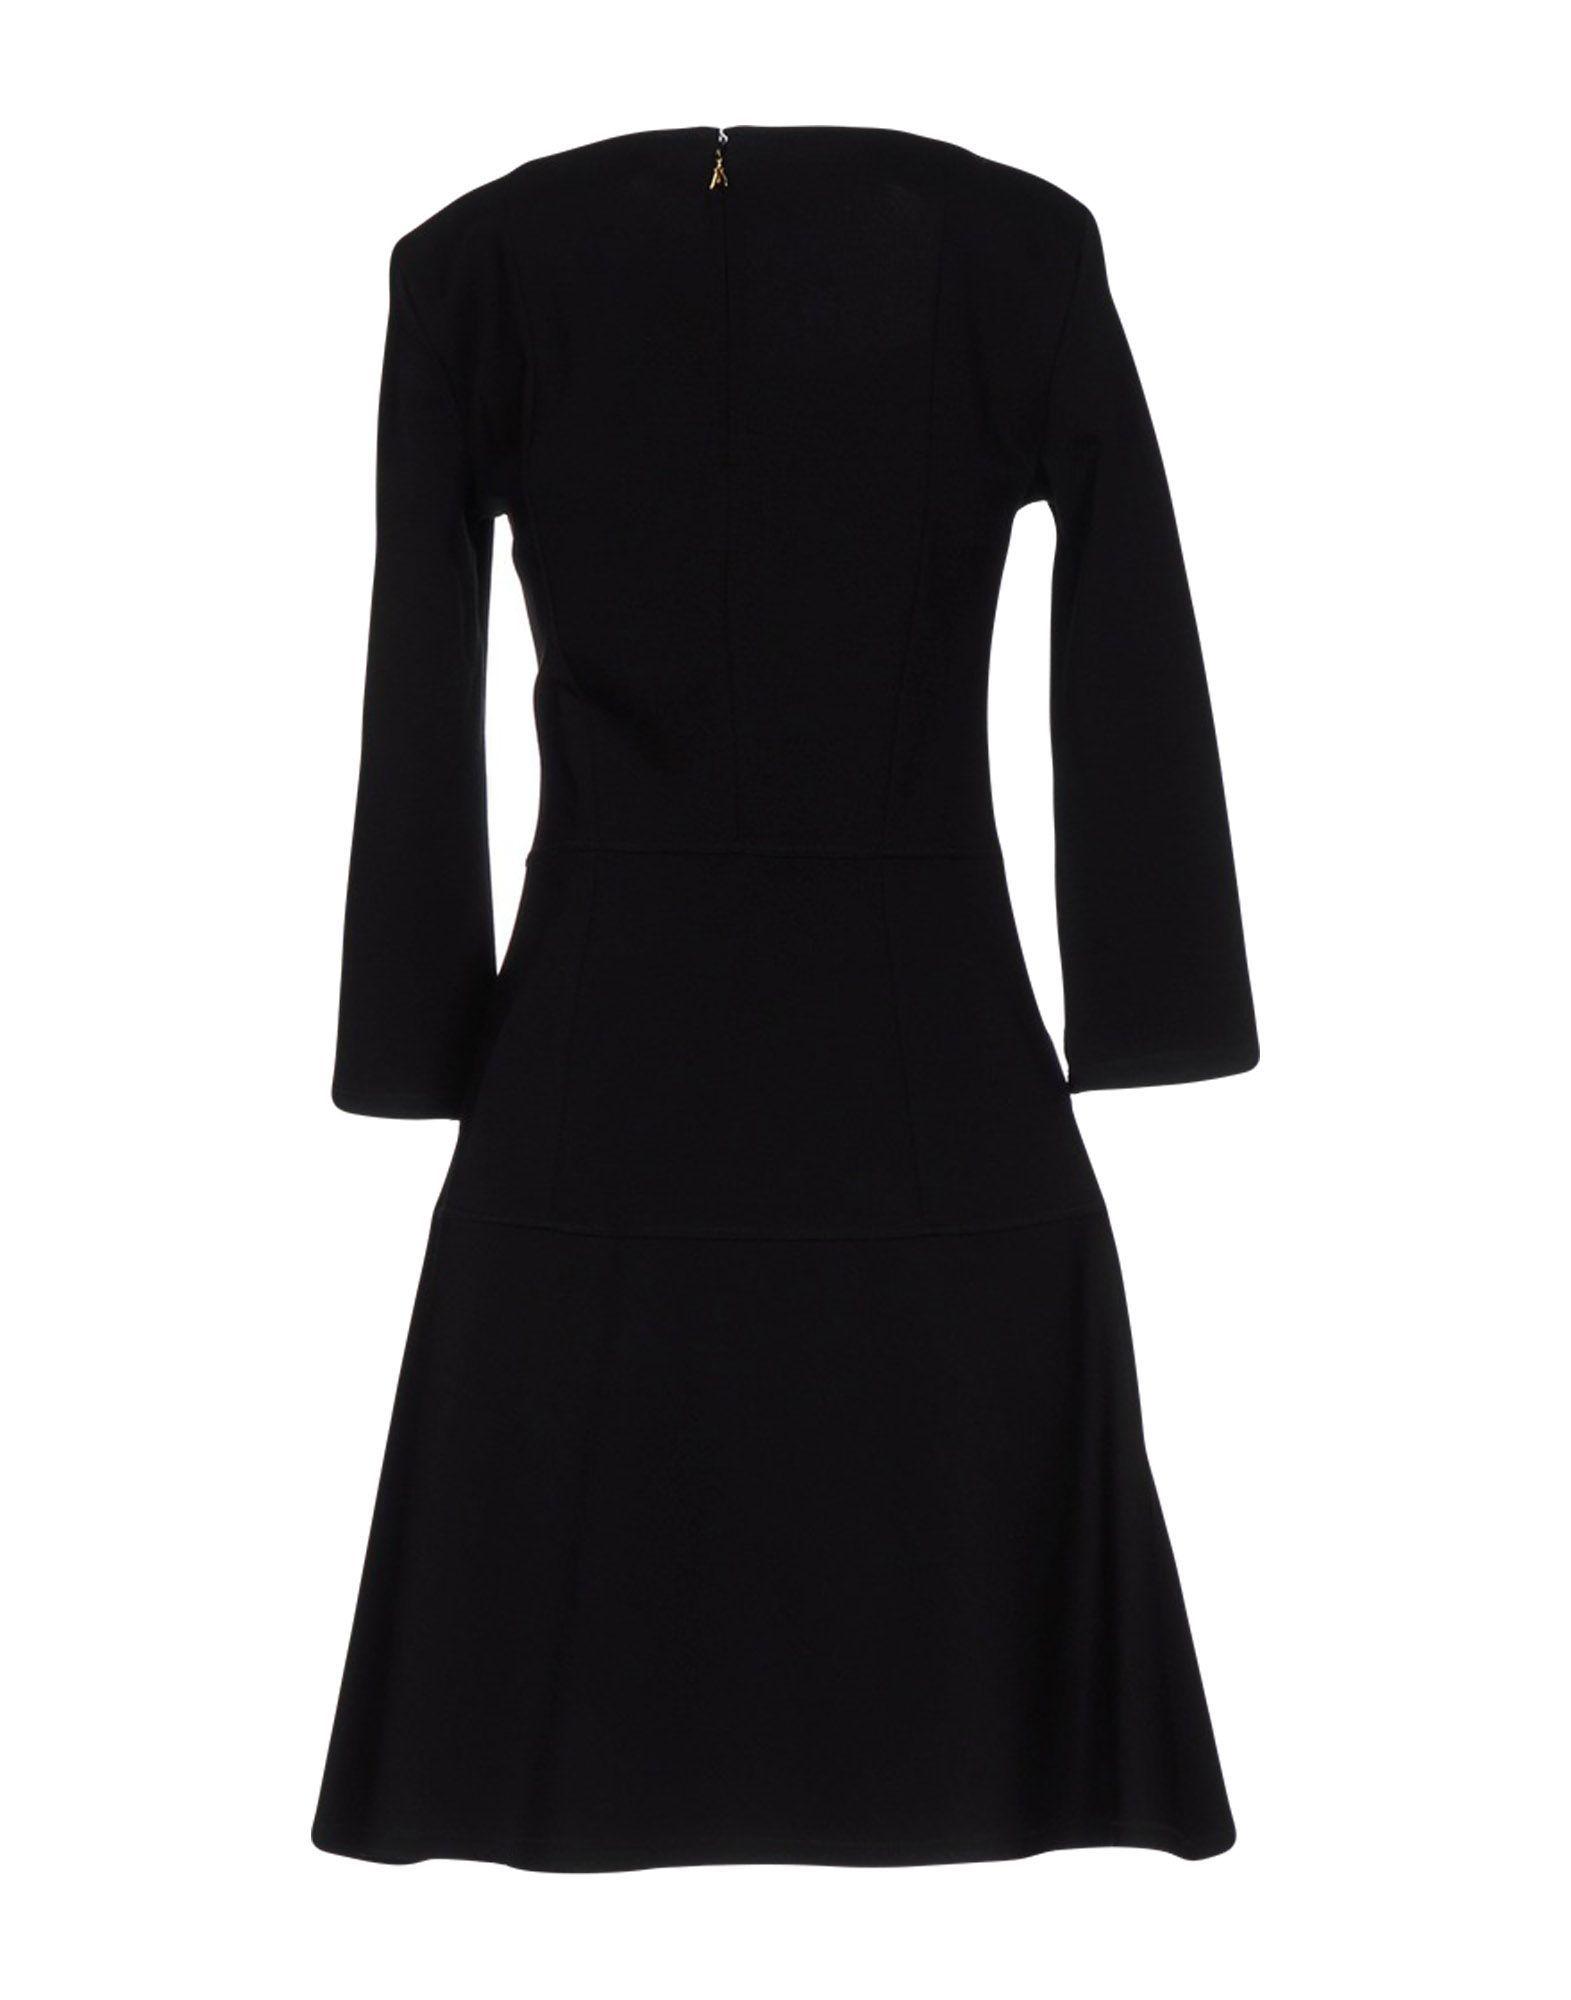 Patrizia Pepe Black Long Sleeve Dress